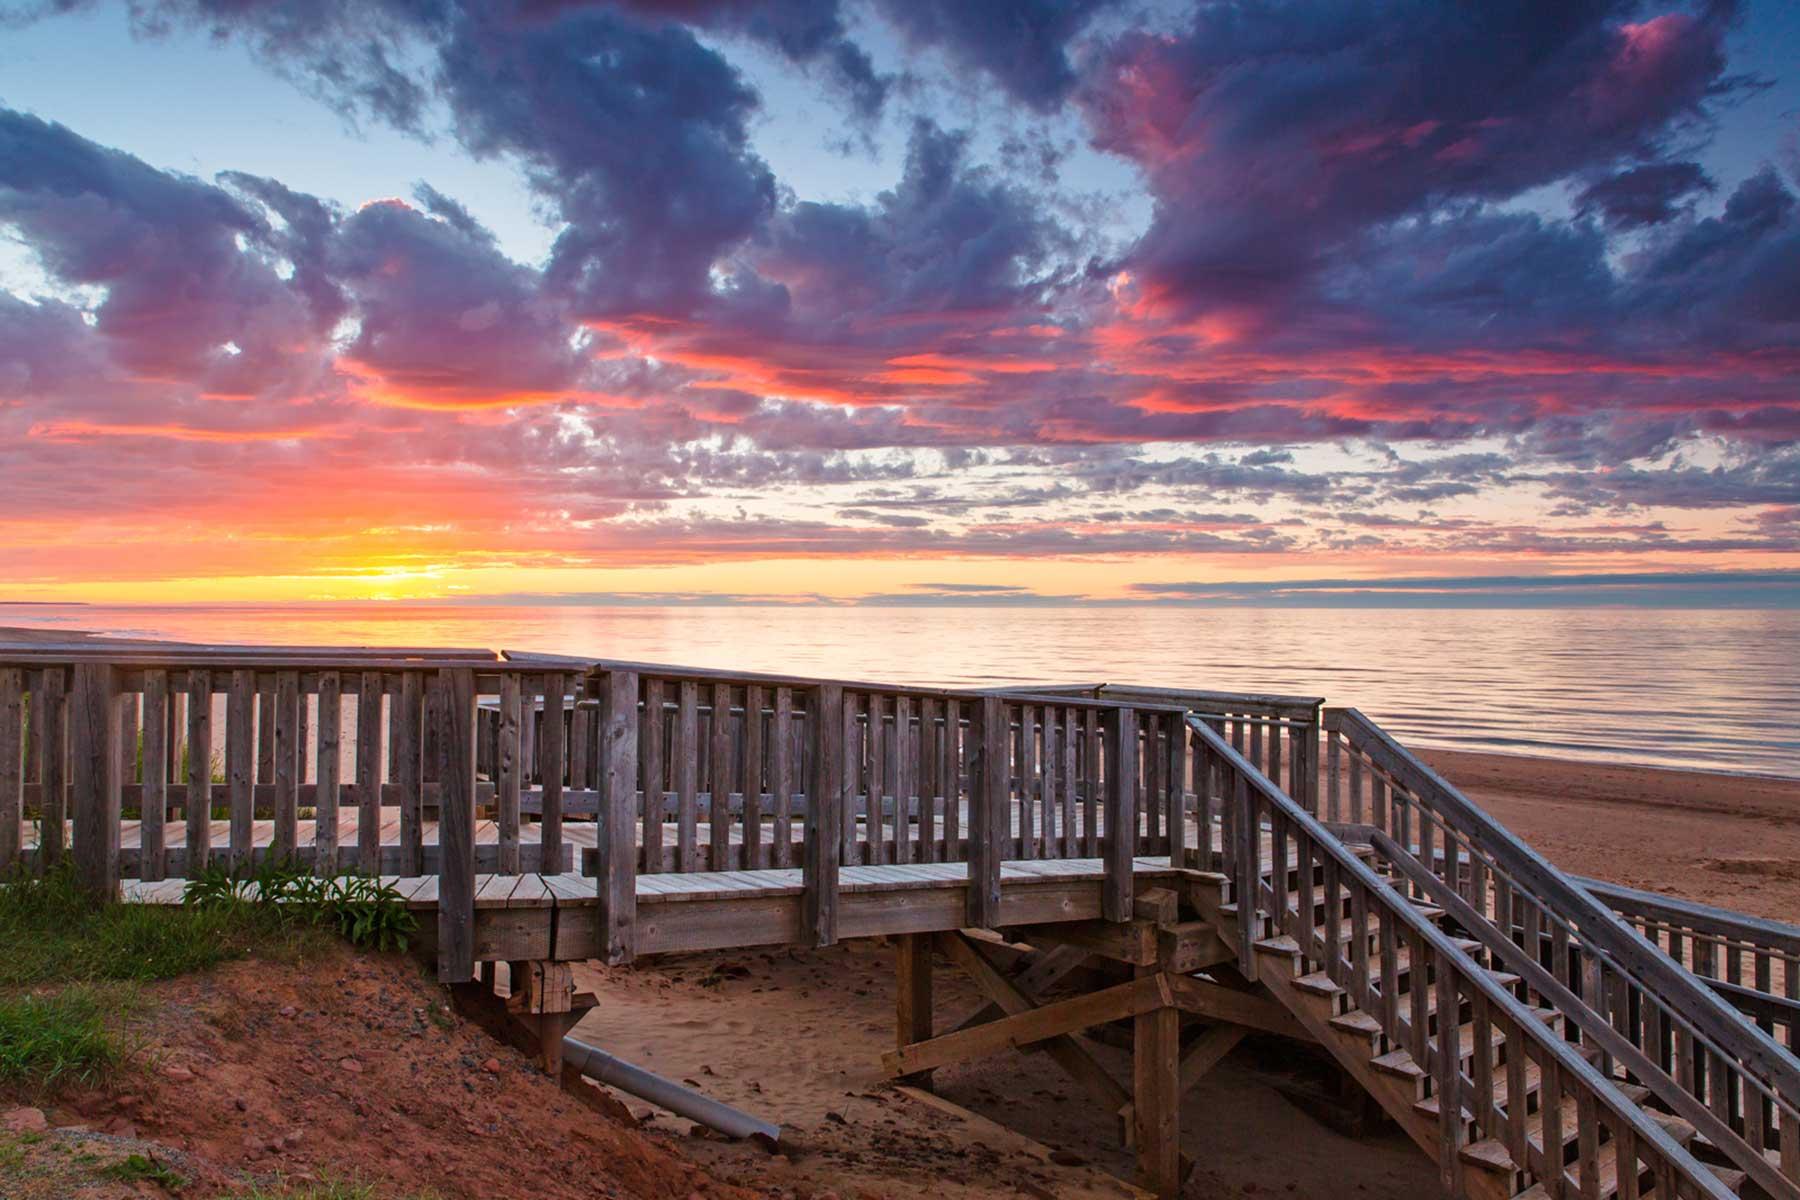 The boardwalk at Stanhope Cape beach, Prince Edward Island